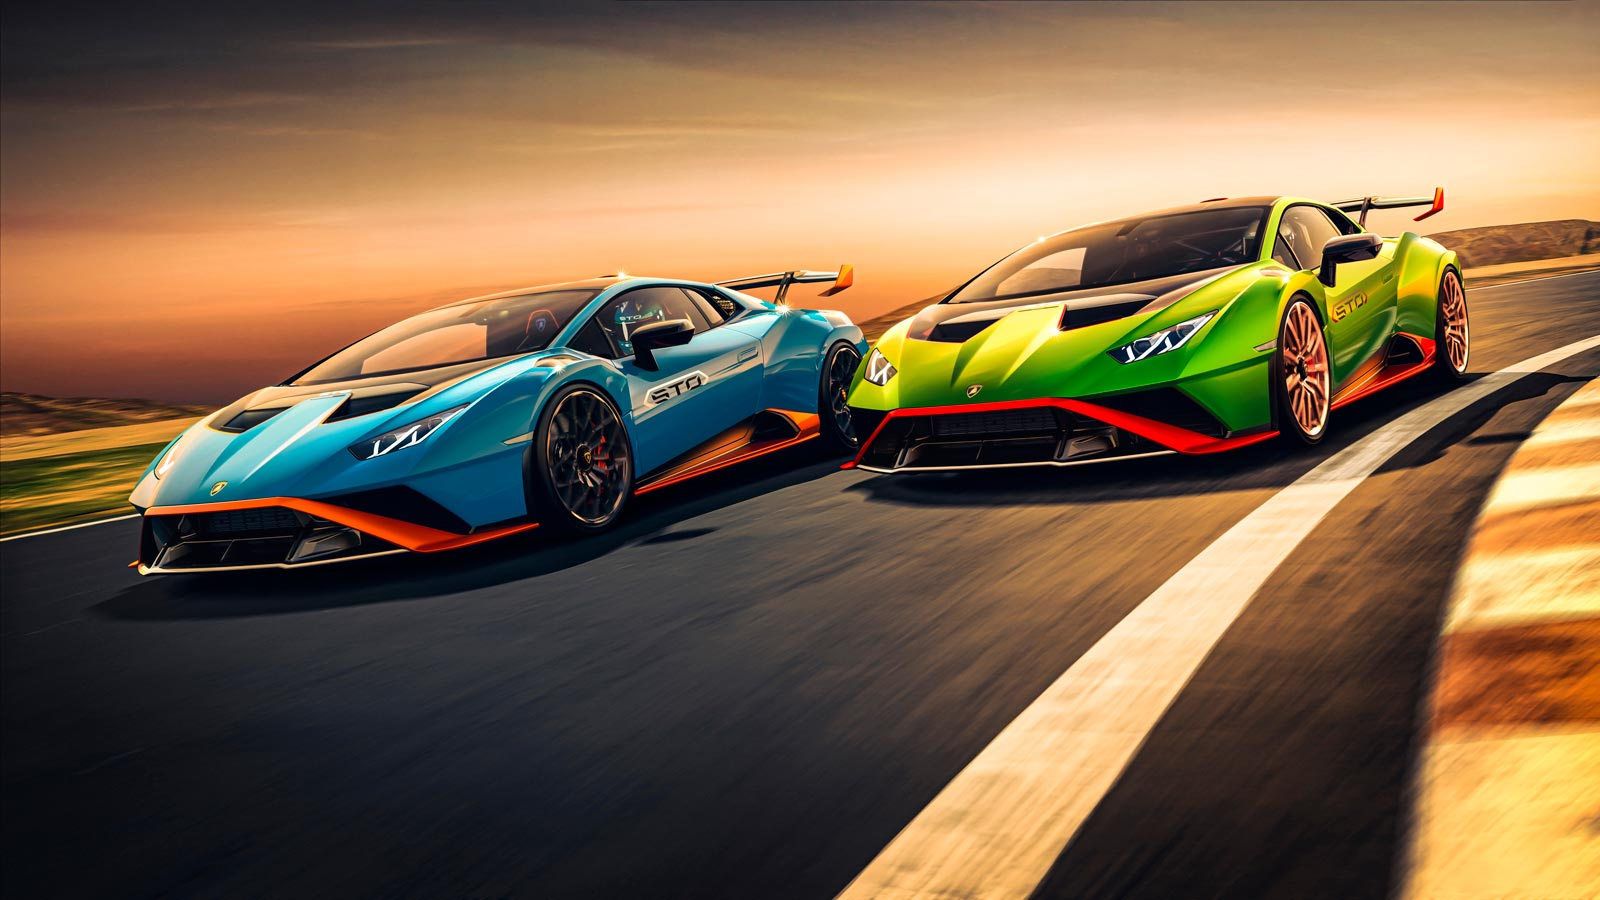 Lamborghini Huracan STO - From racetrack to road image 14